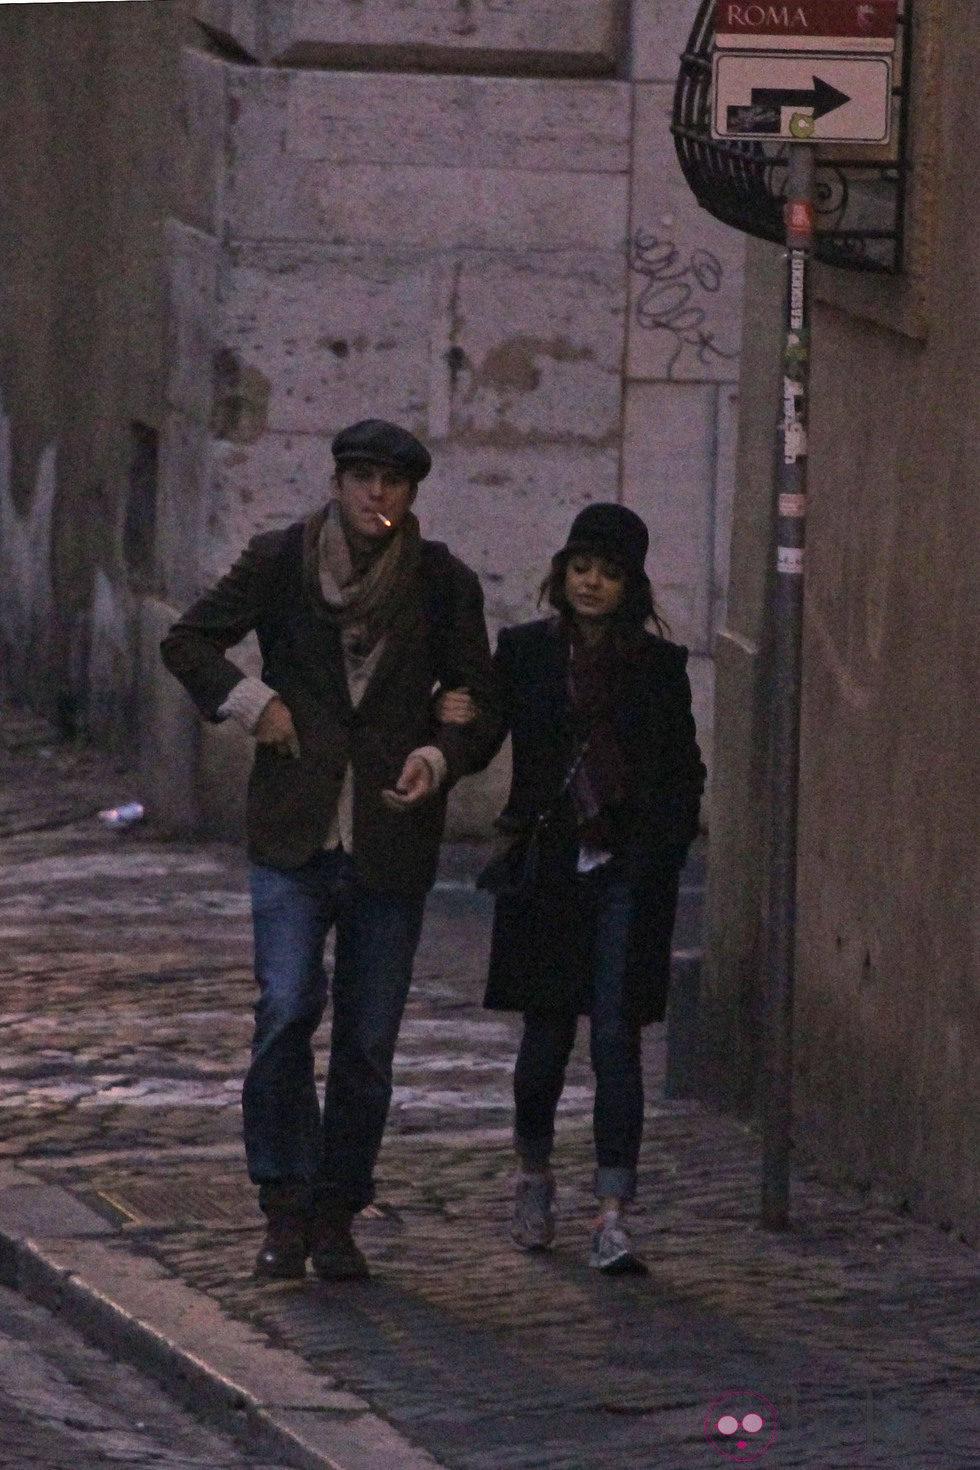 Ashton Kutcher y Mila Kunis dando un paseo matinal por Roma